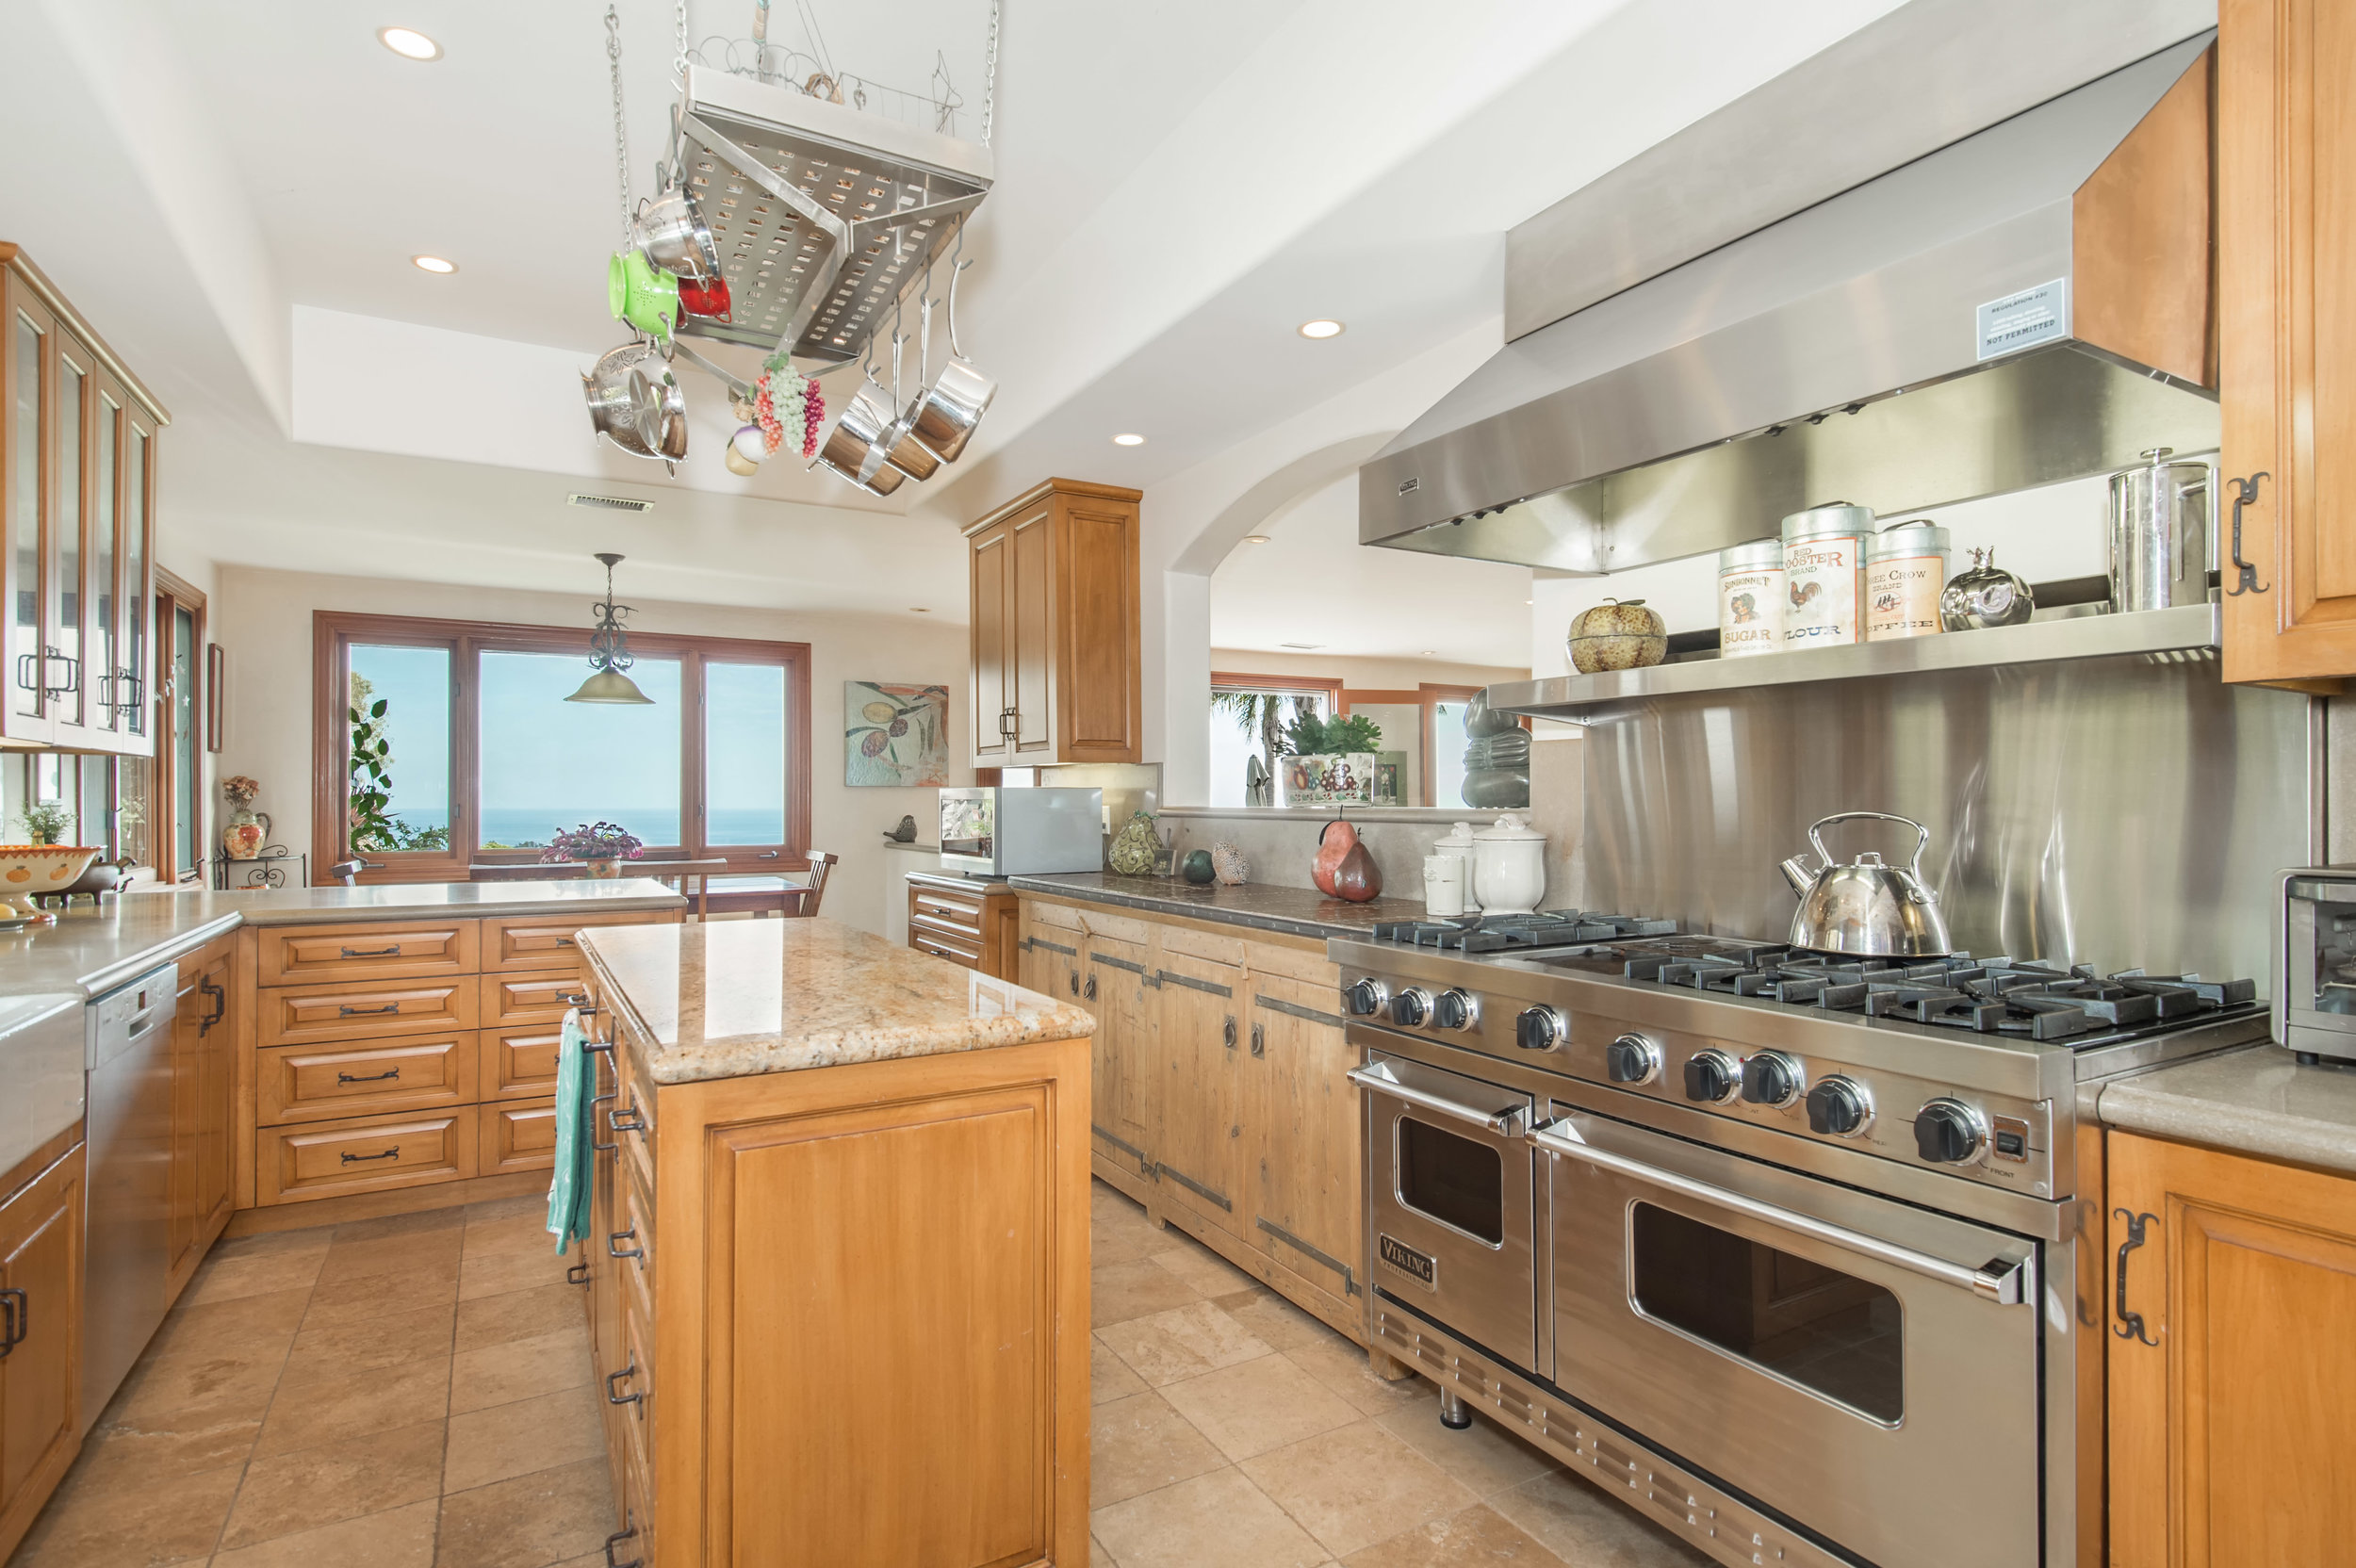 004 kitchen 29660 Harvester Road Malibu For Sale The Malibu Life Team Luxury Real Estate.jpg